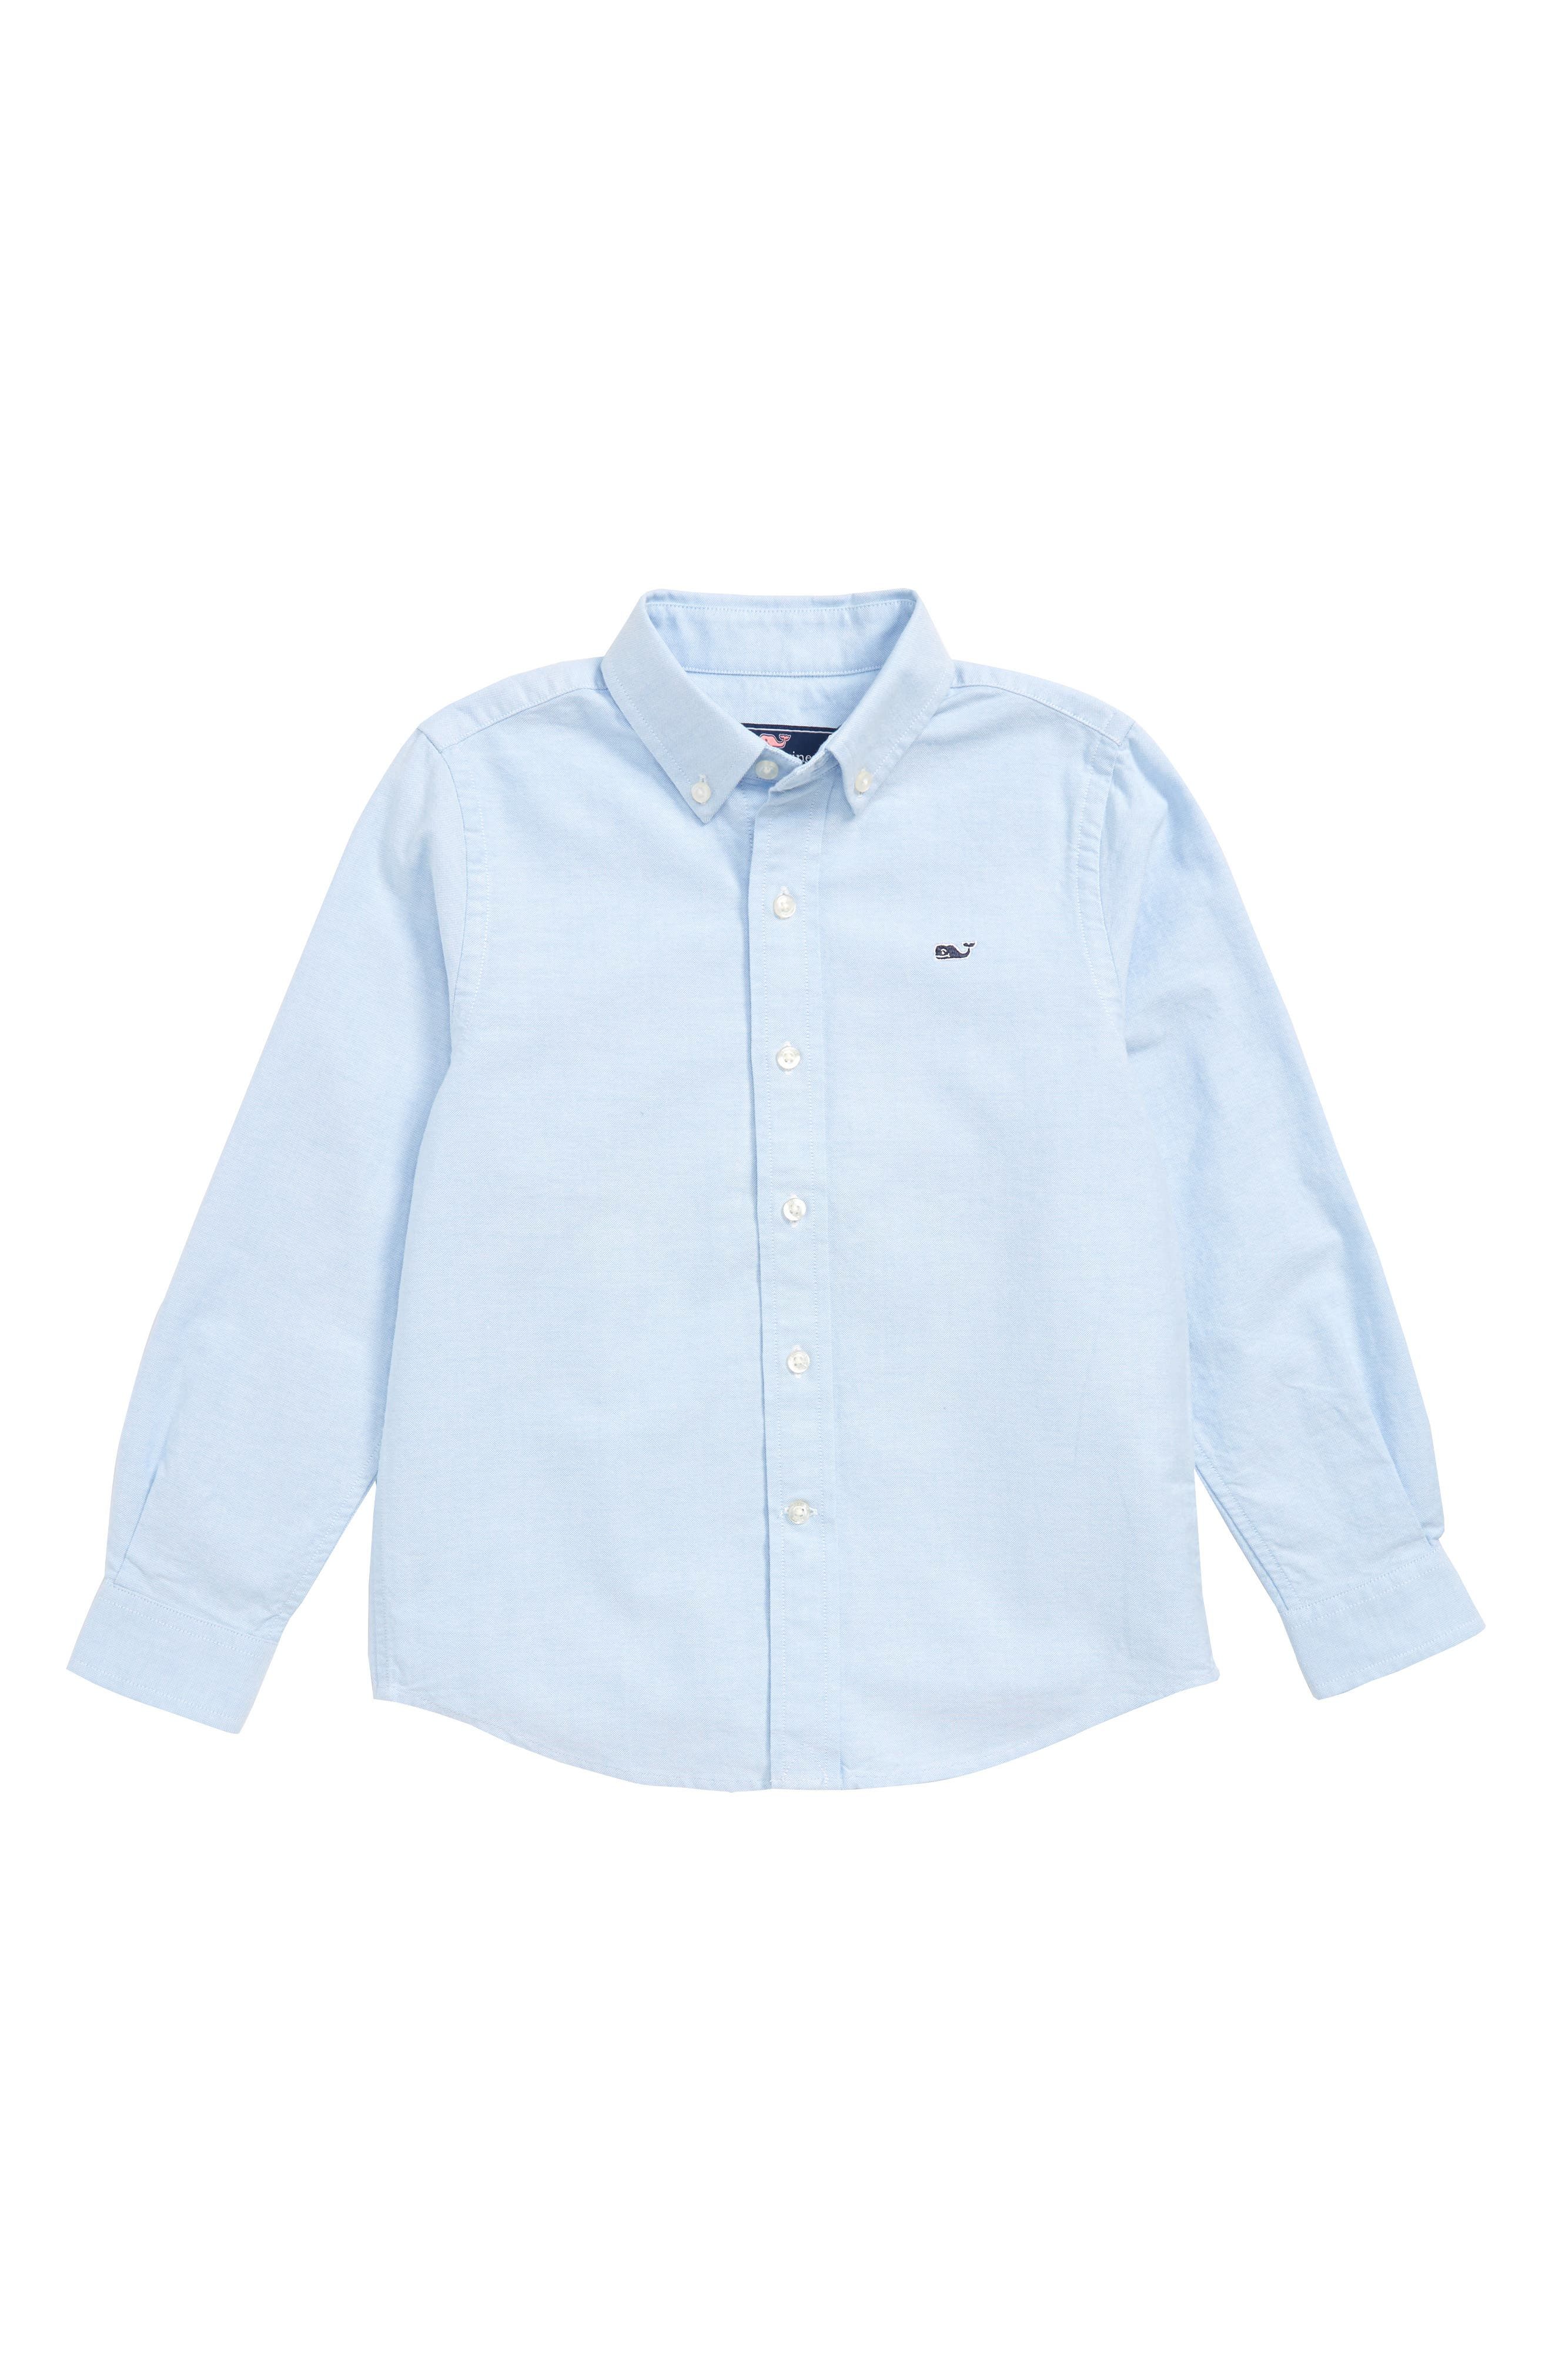 Toddler Boys Vineyard Vines Woven Oxford Shirt Size 2T  Blue